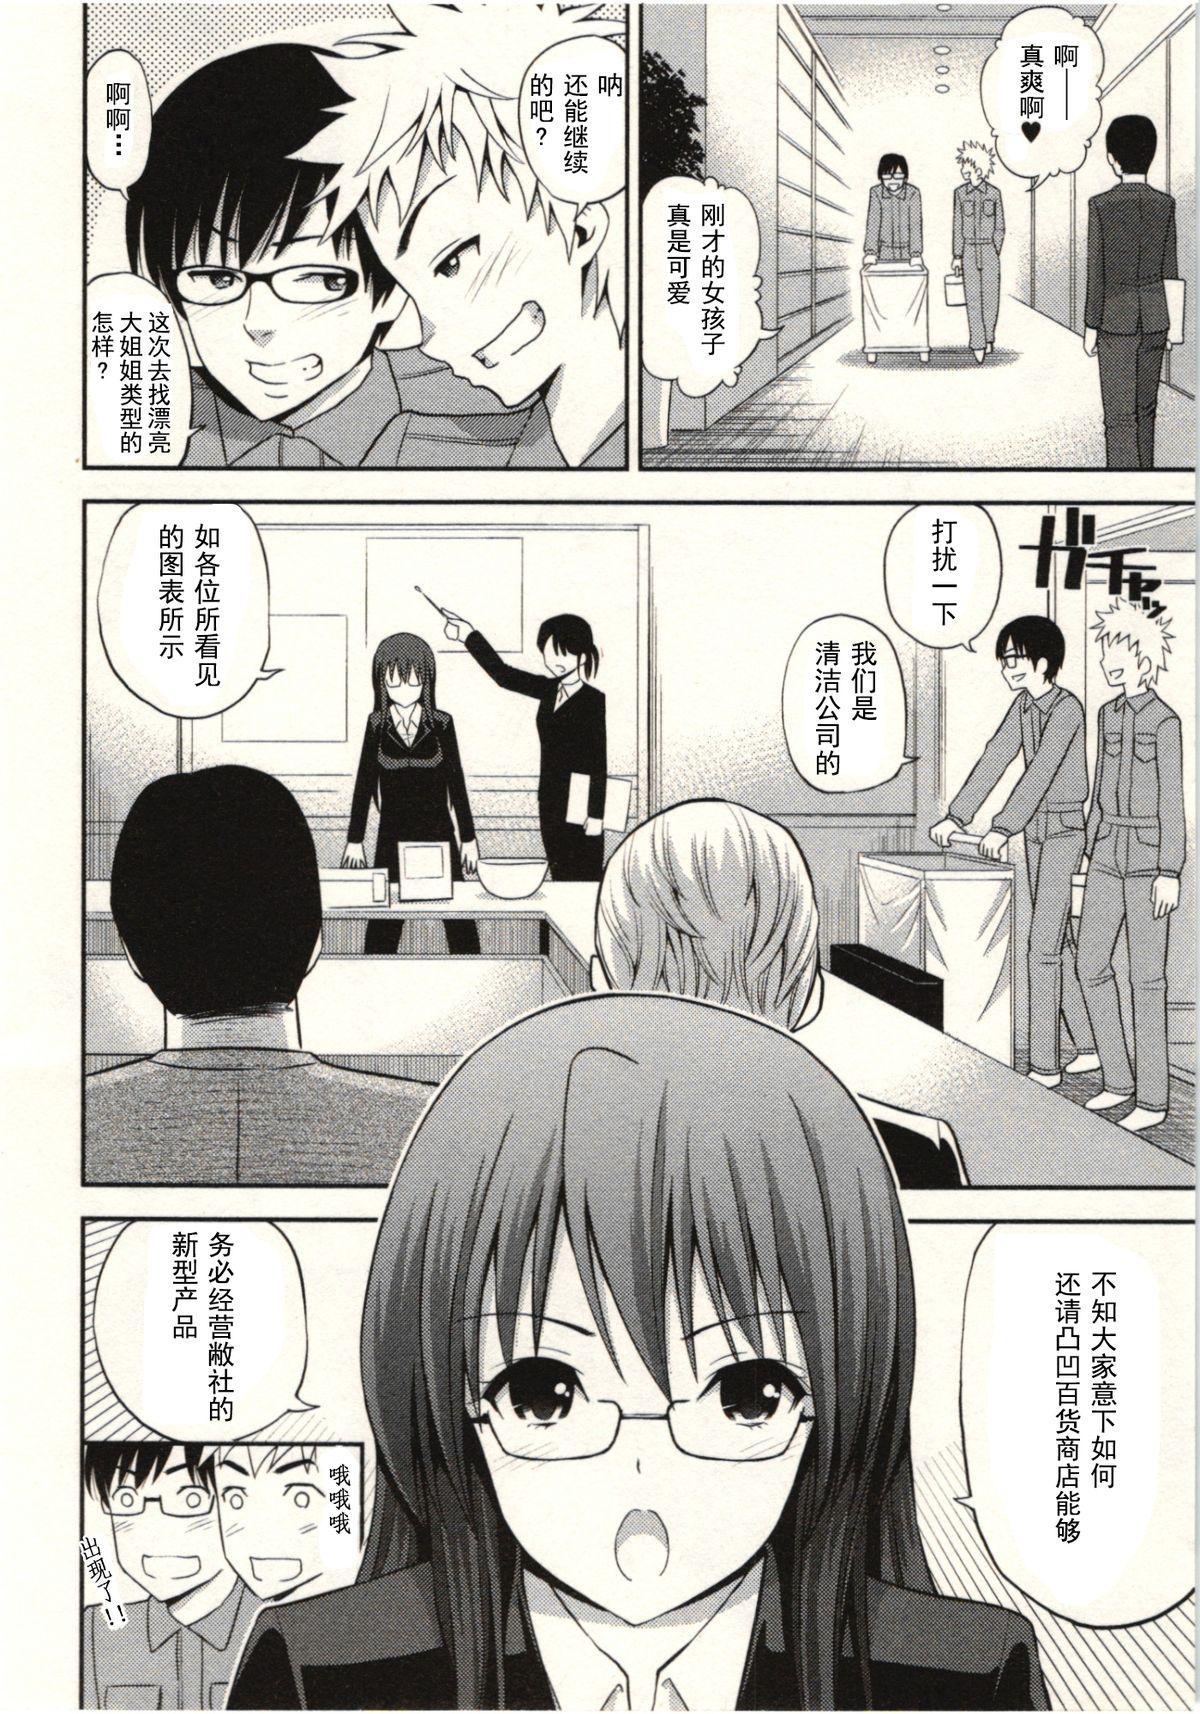 Tadashii Majutsu no Asobikata - The right way of playing of magic. 146